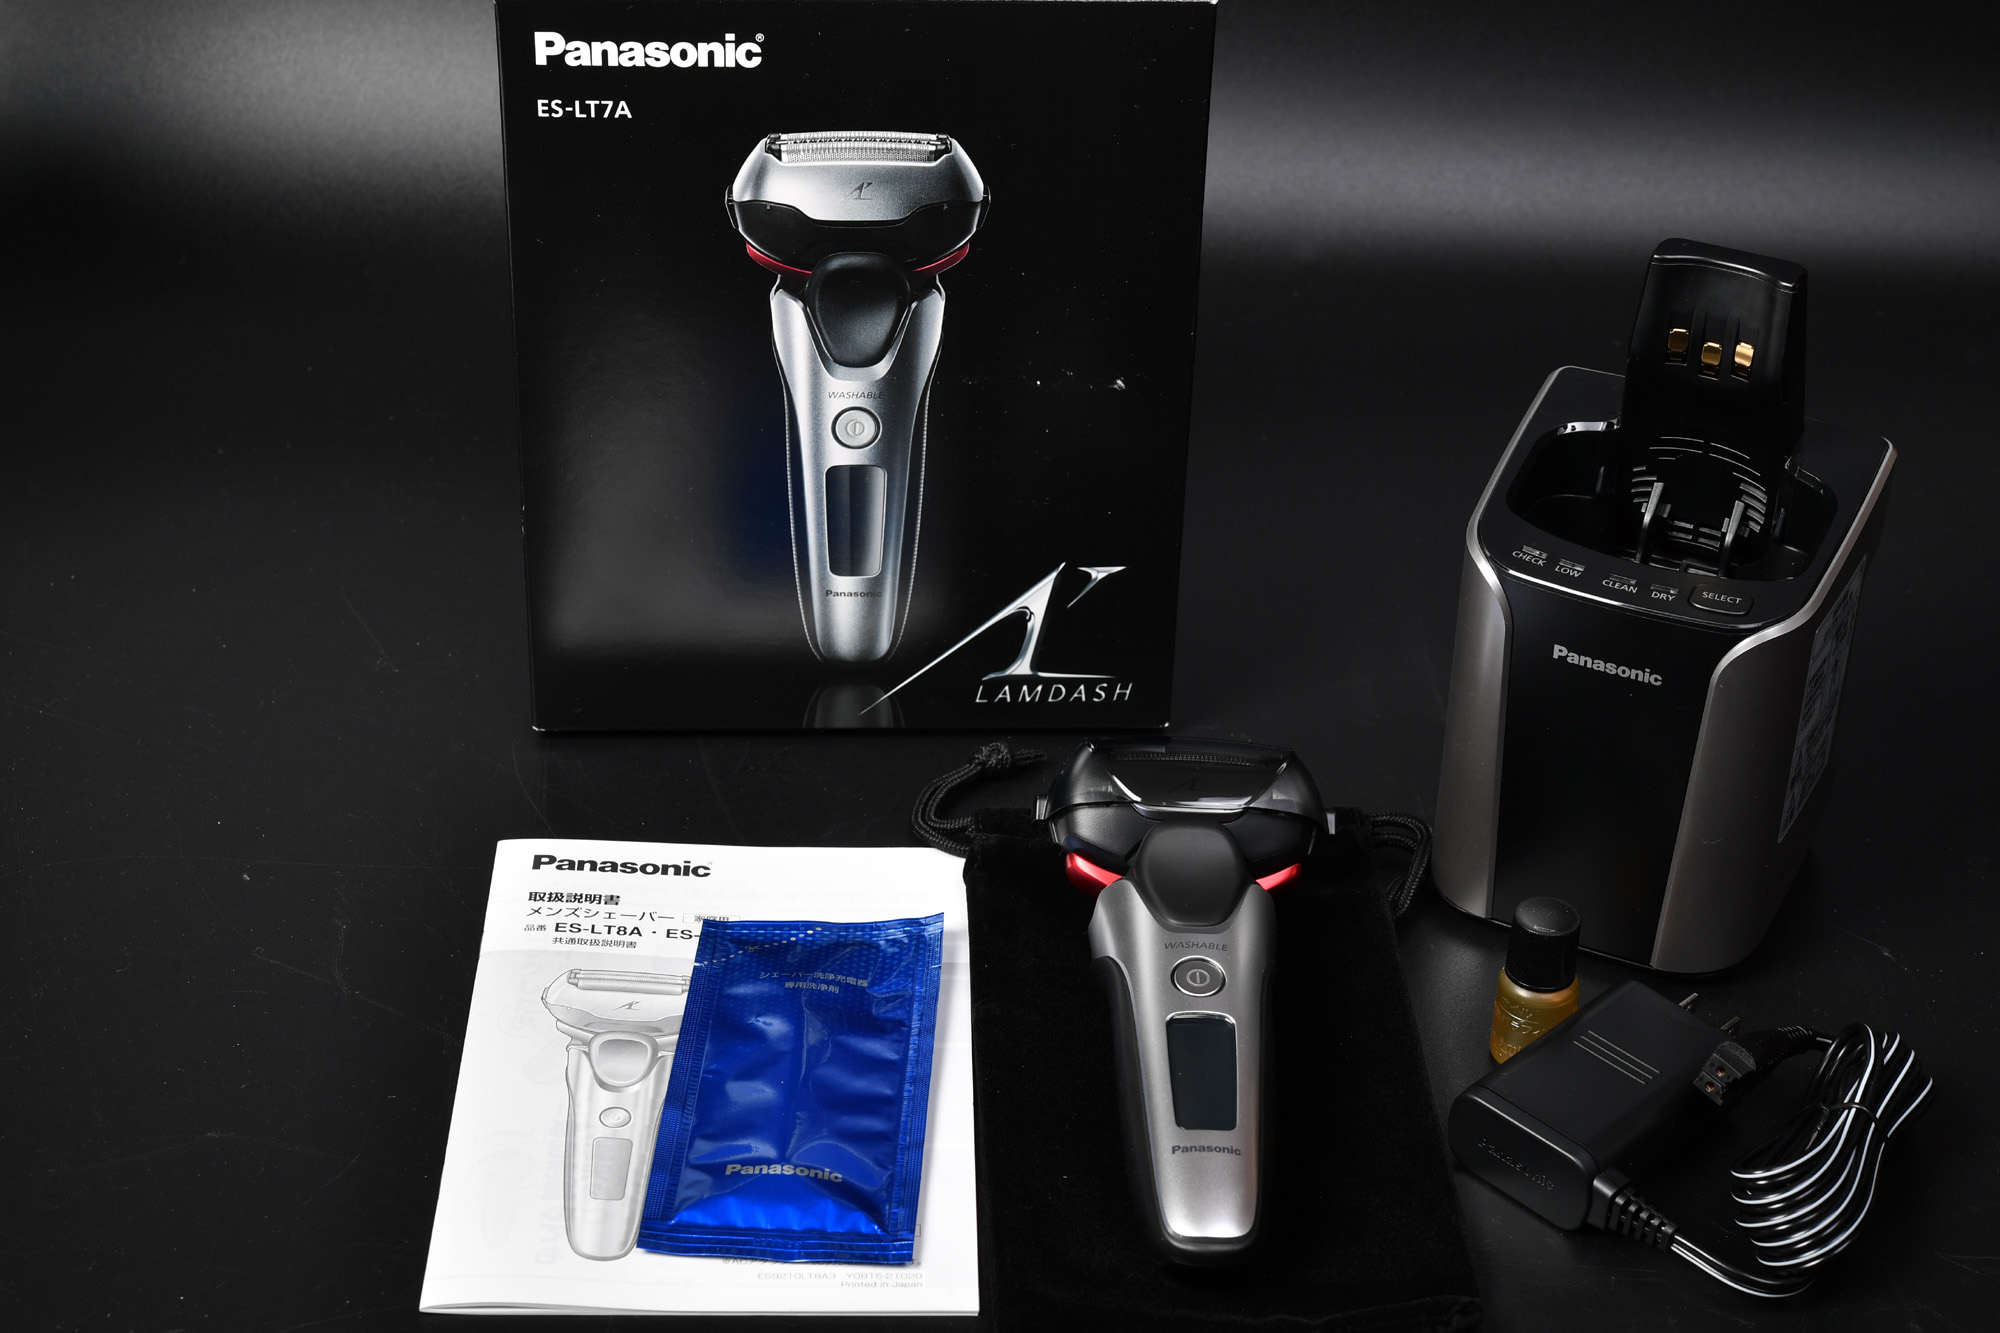 Panasonic 3枚刃ラムダッシュ ES-LT7A 購入 レビュー